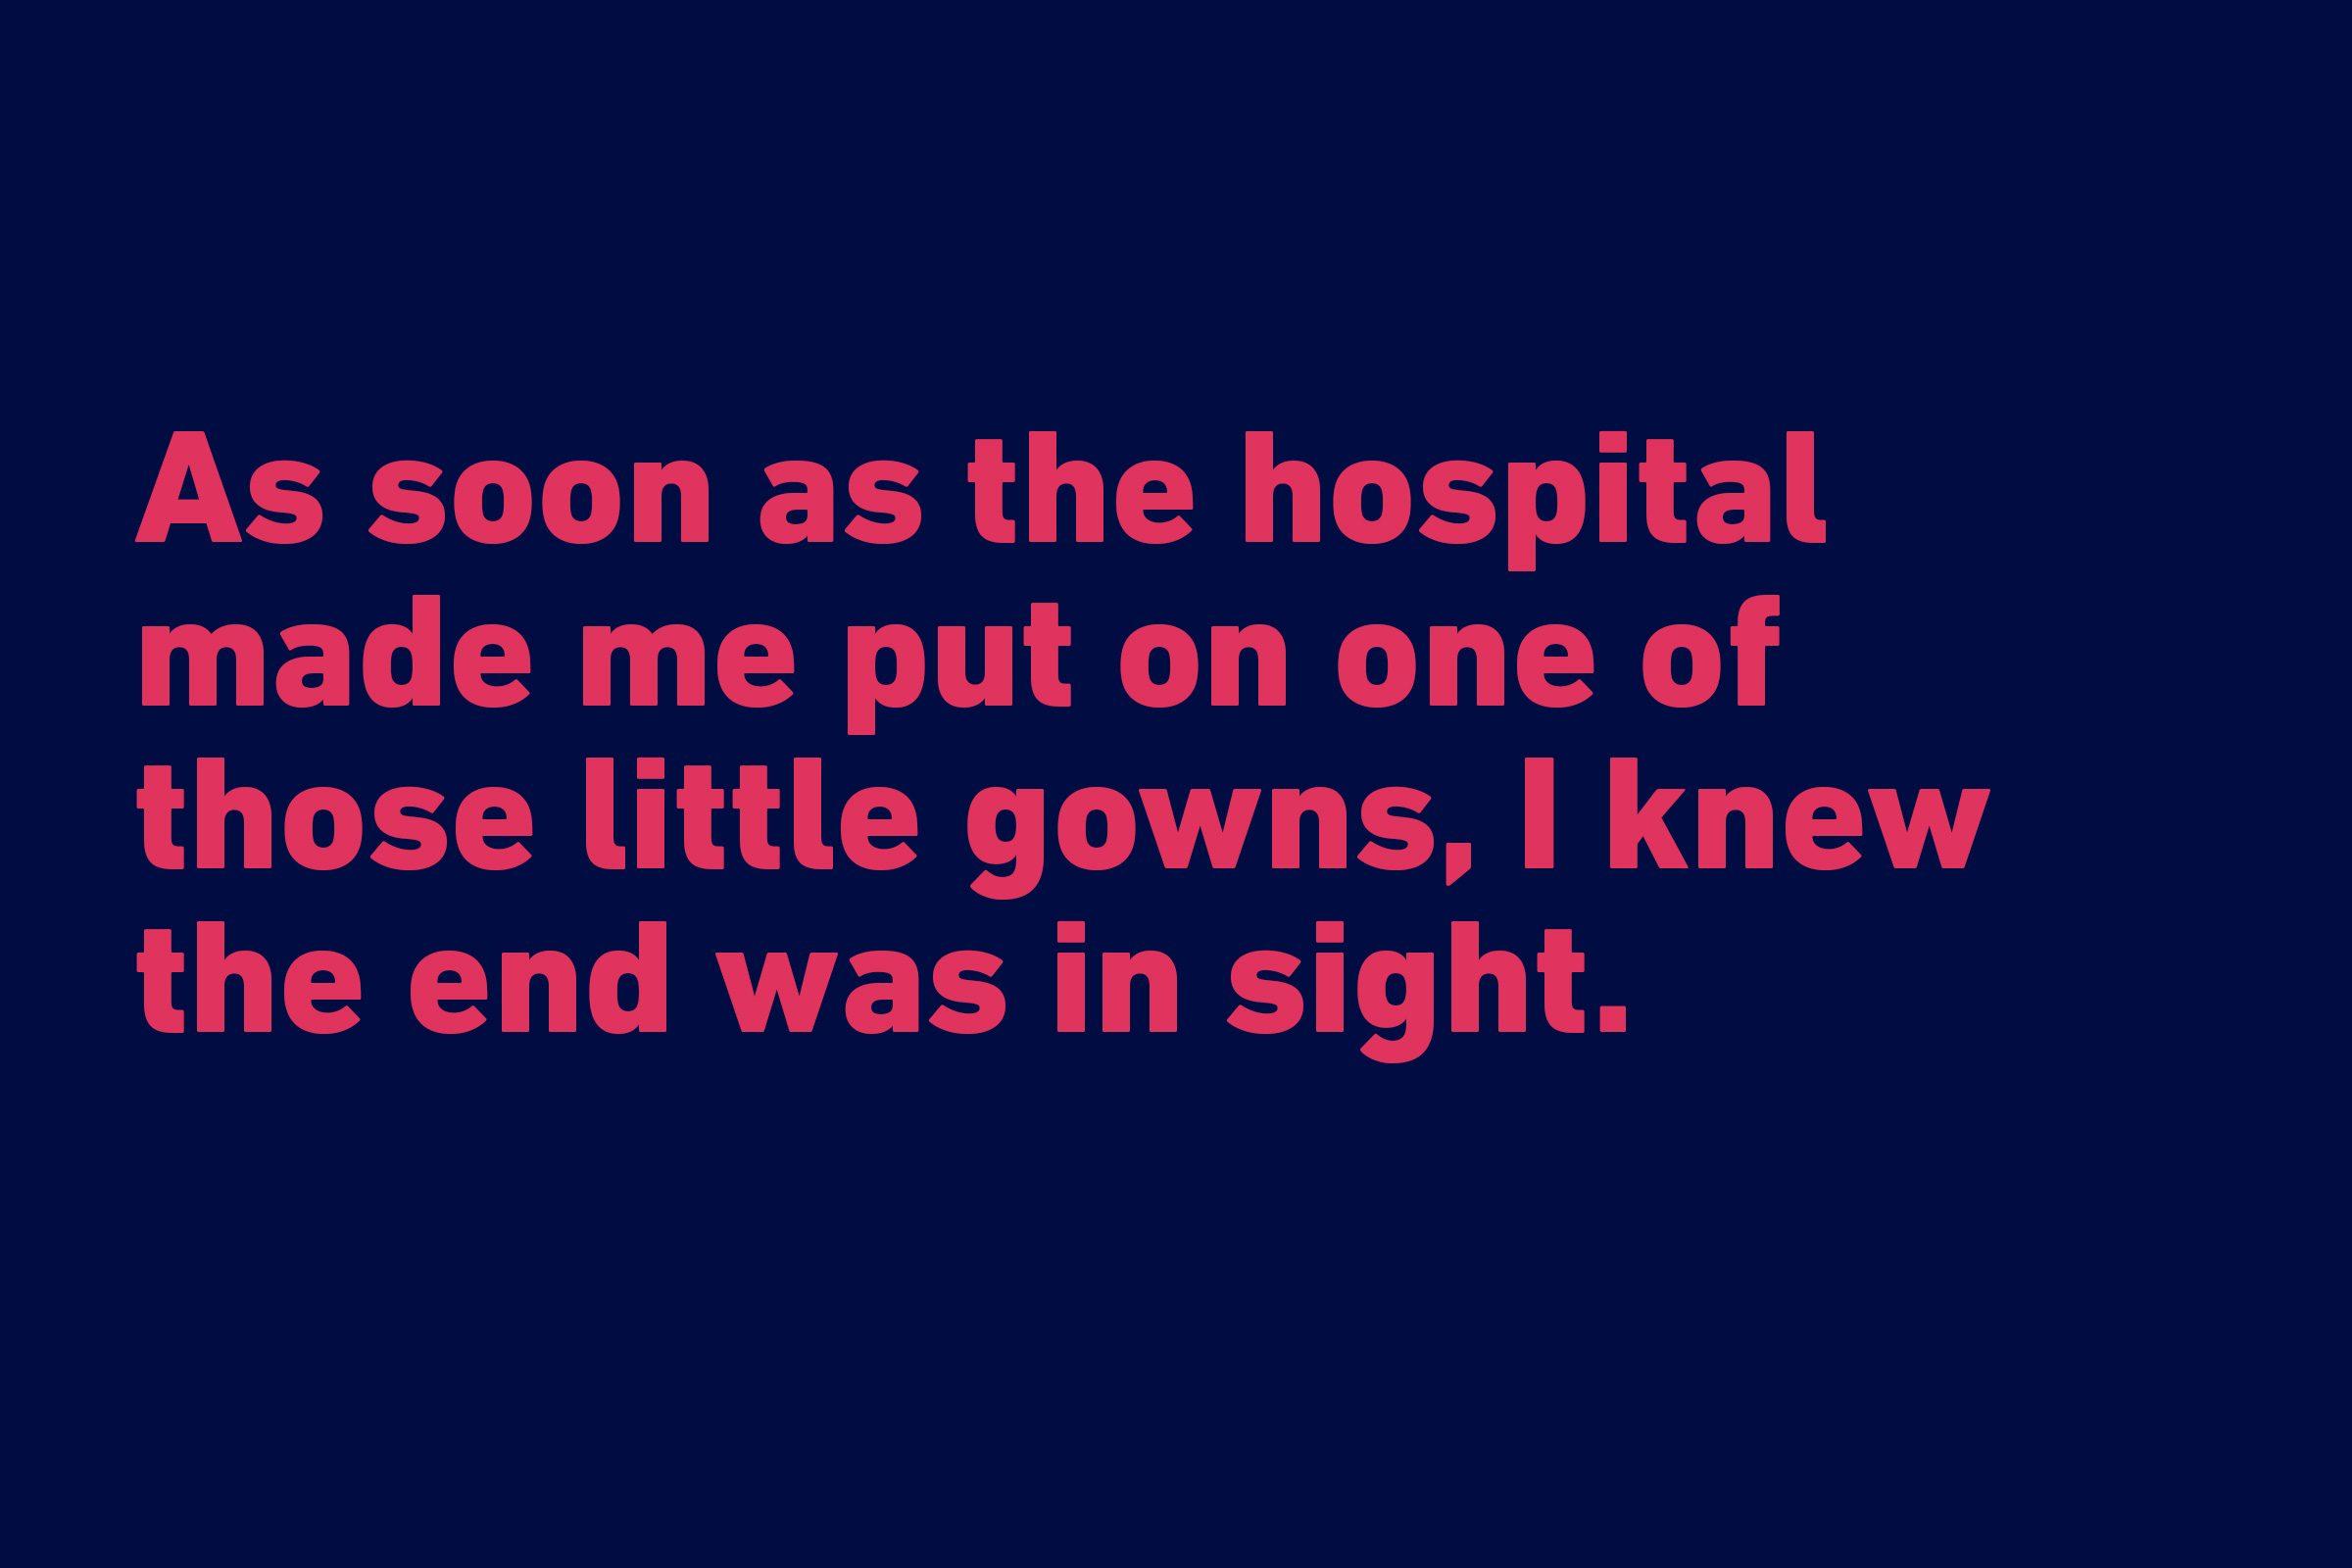 funny quote adam joshua smargon hospital